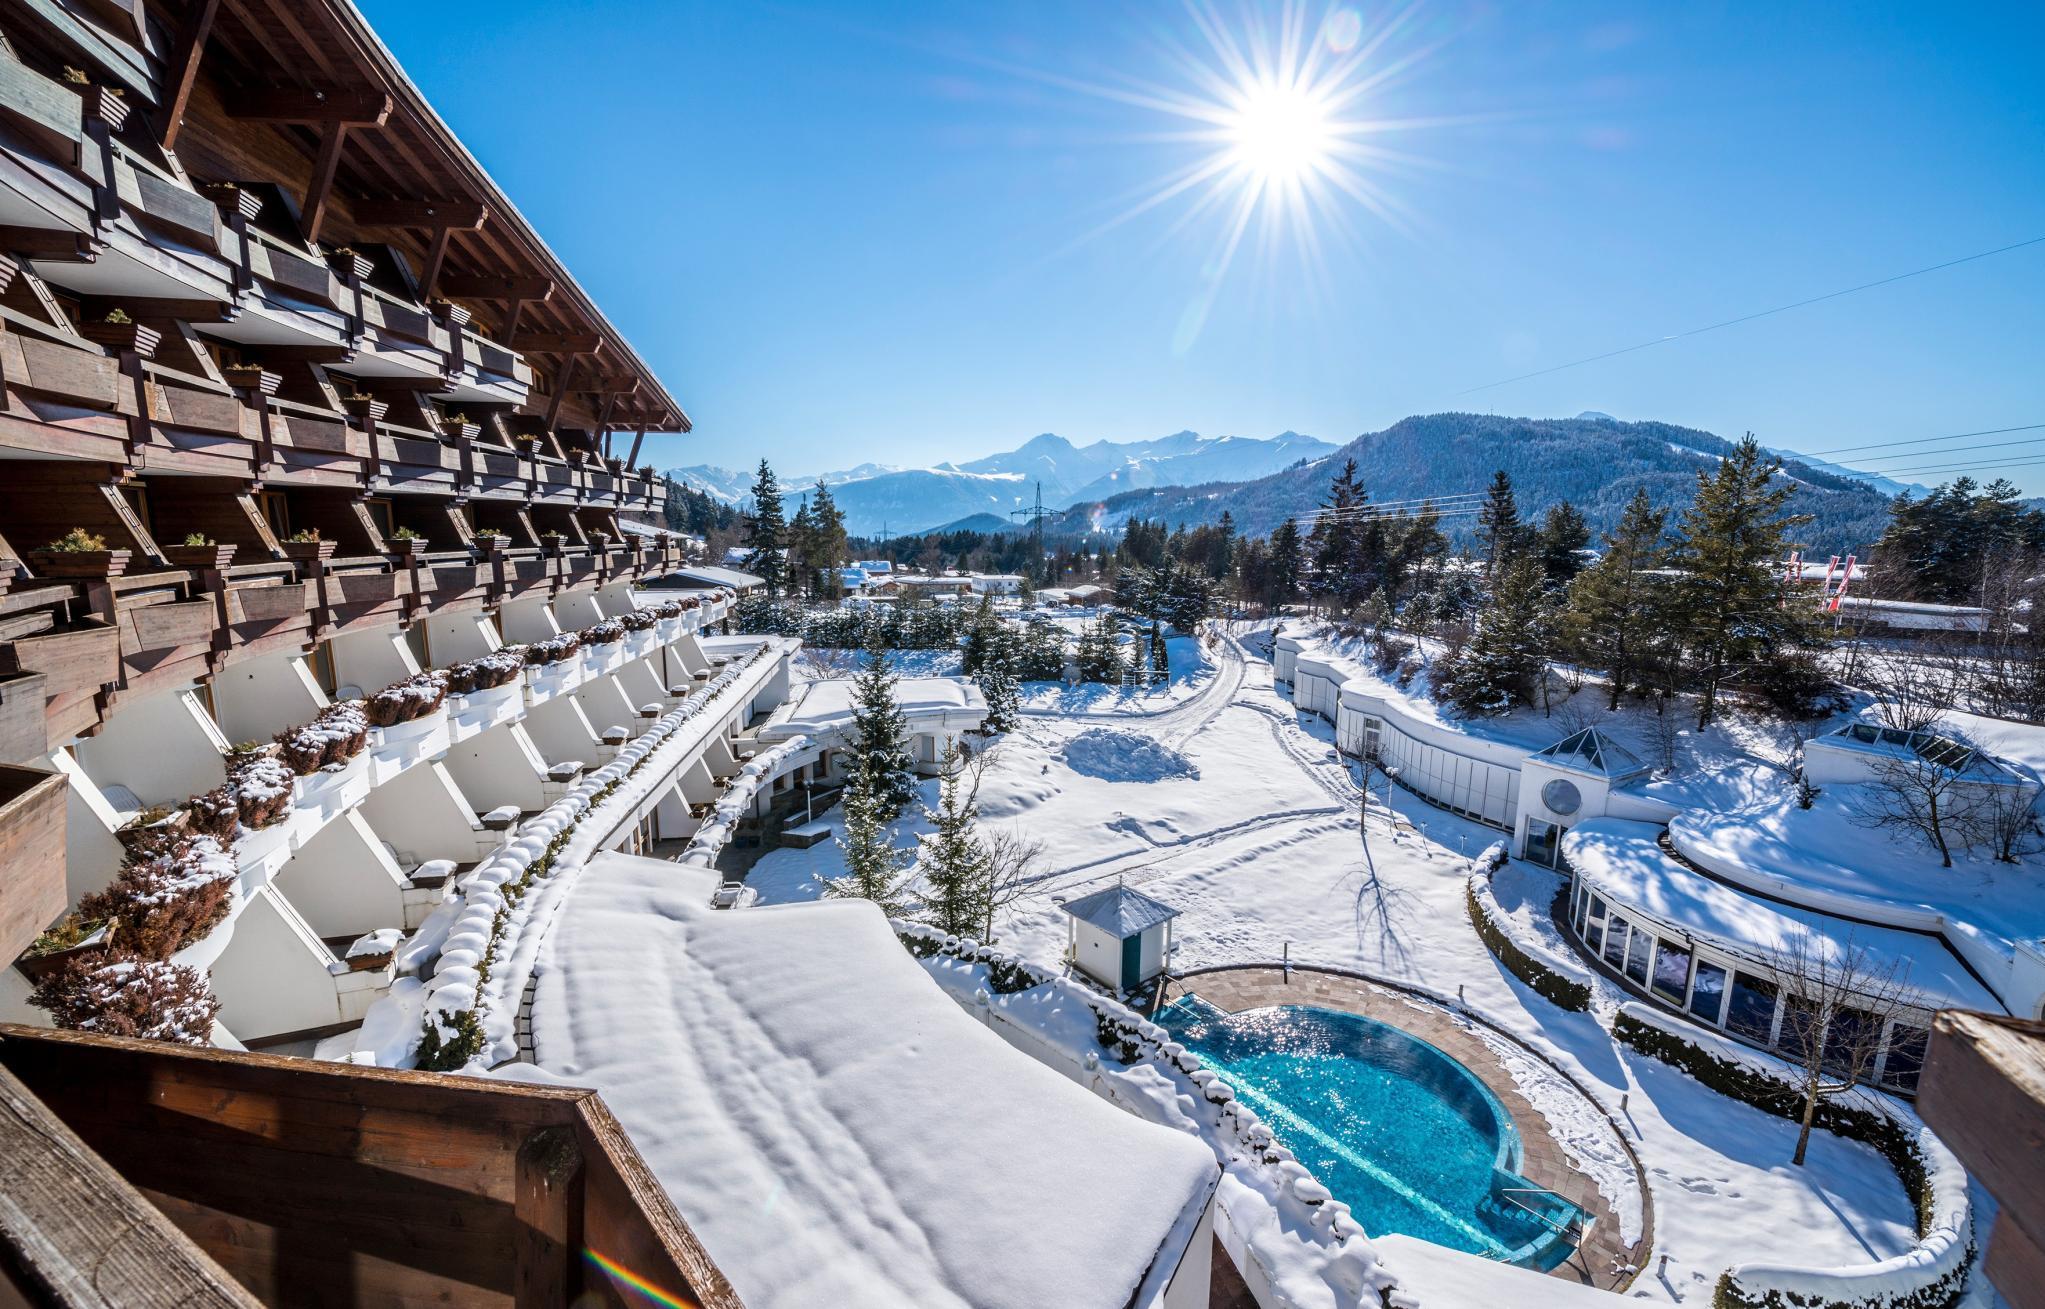 Krumers Alpin Resort Spa Tirol